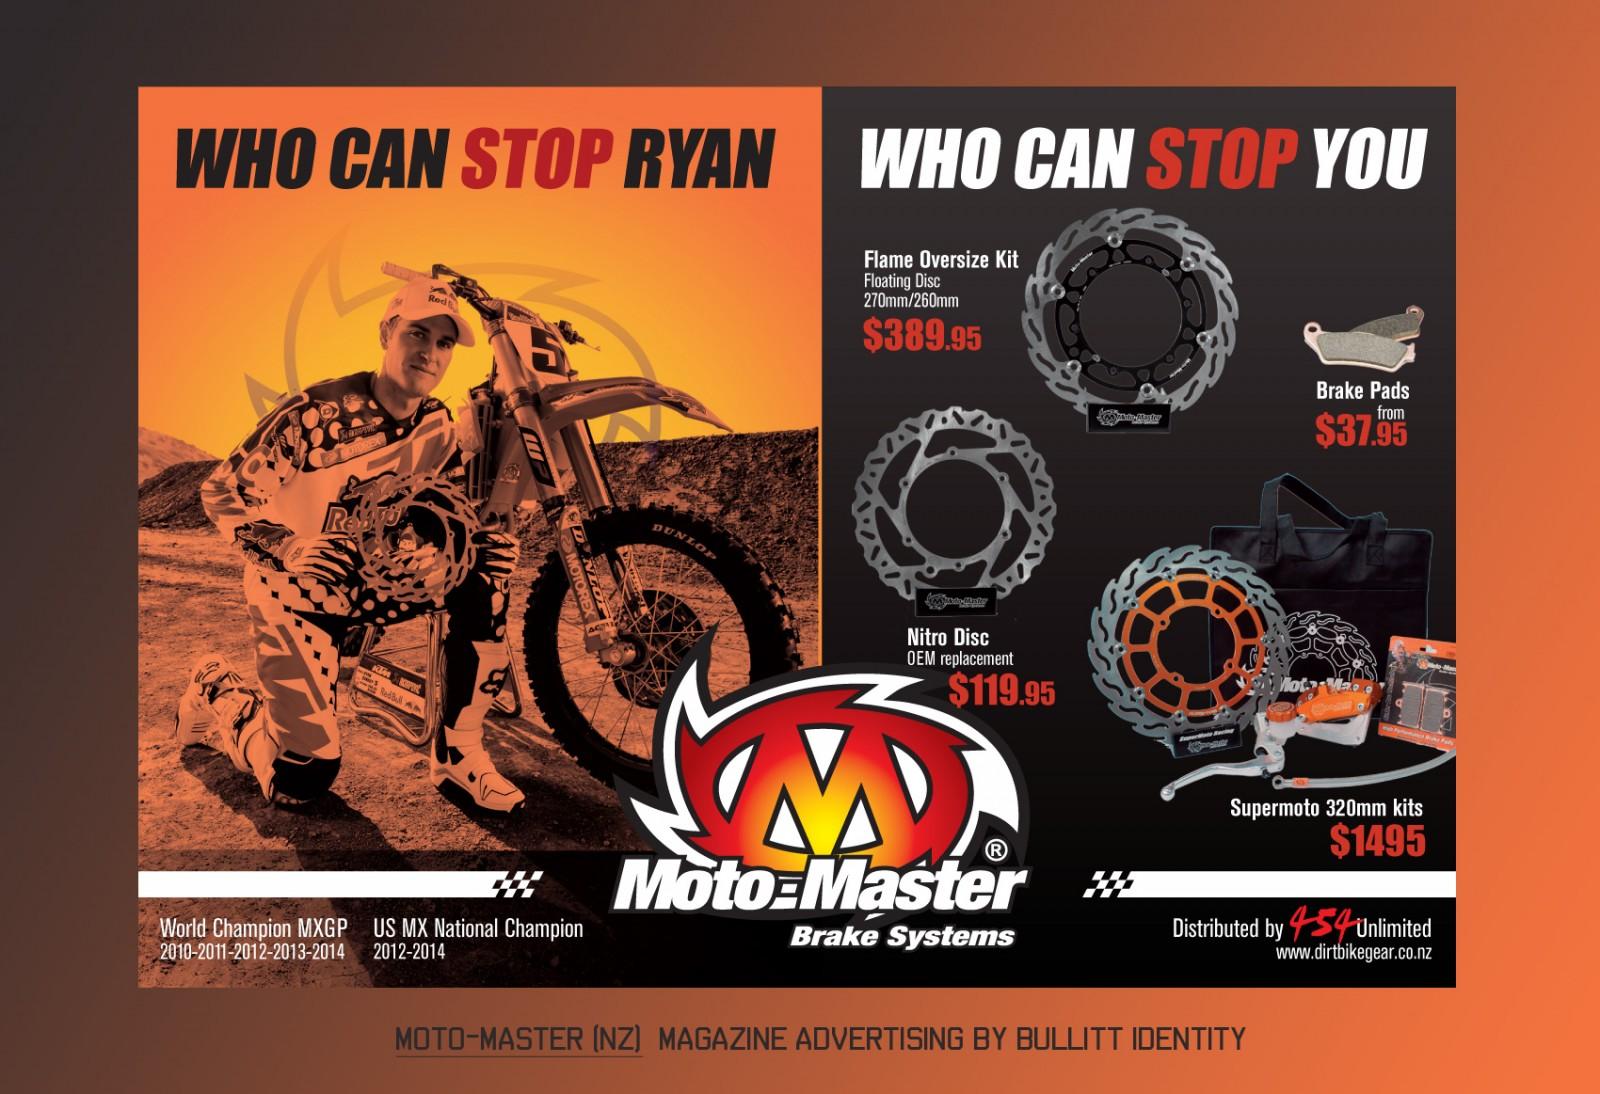 Moto-Master ads